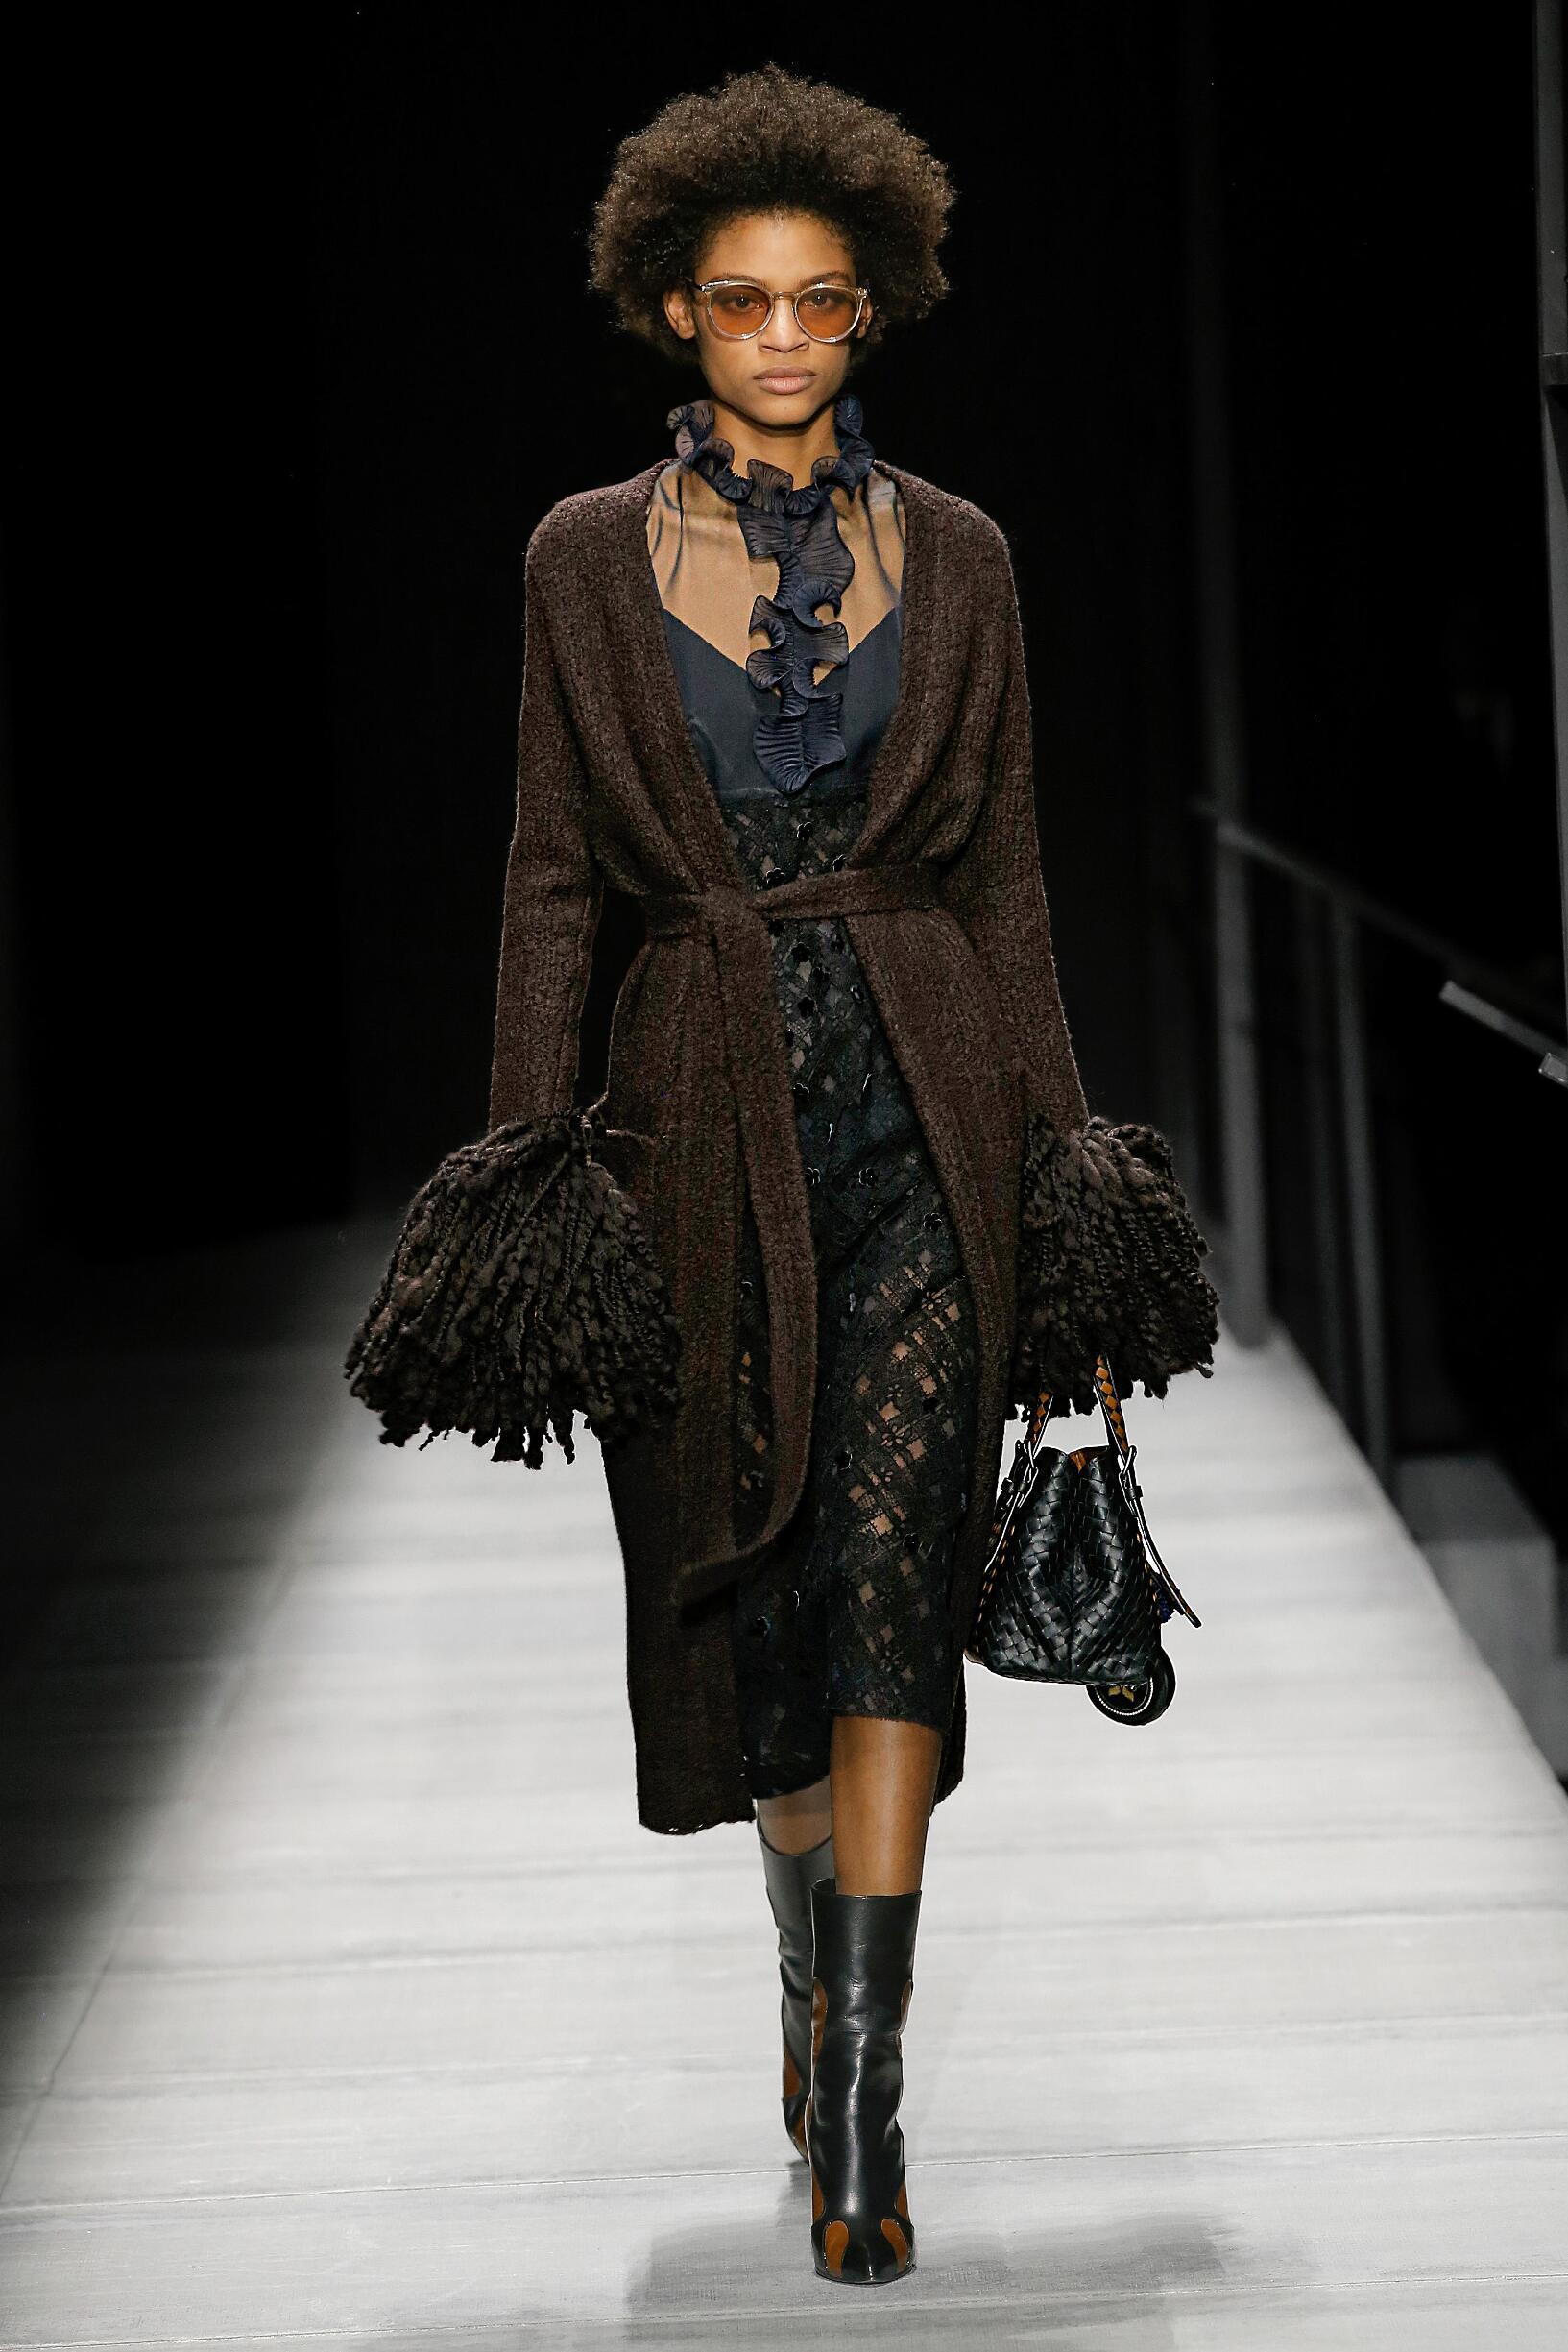 Fall Fashion Woman Trends 2018 Bottega Veneta